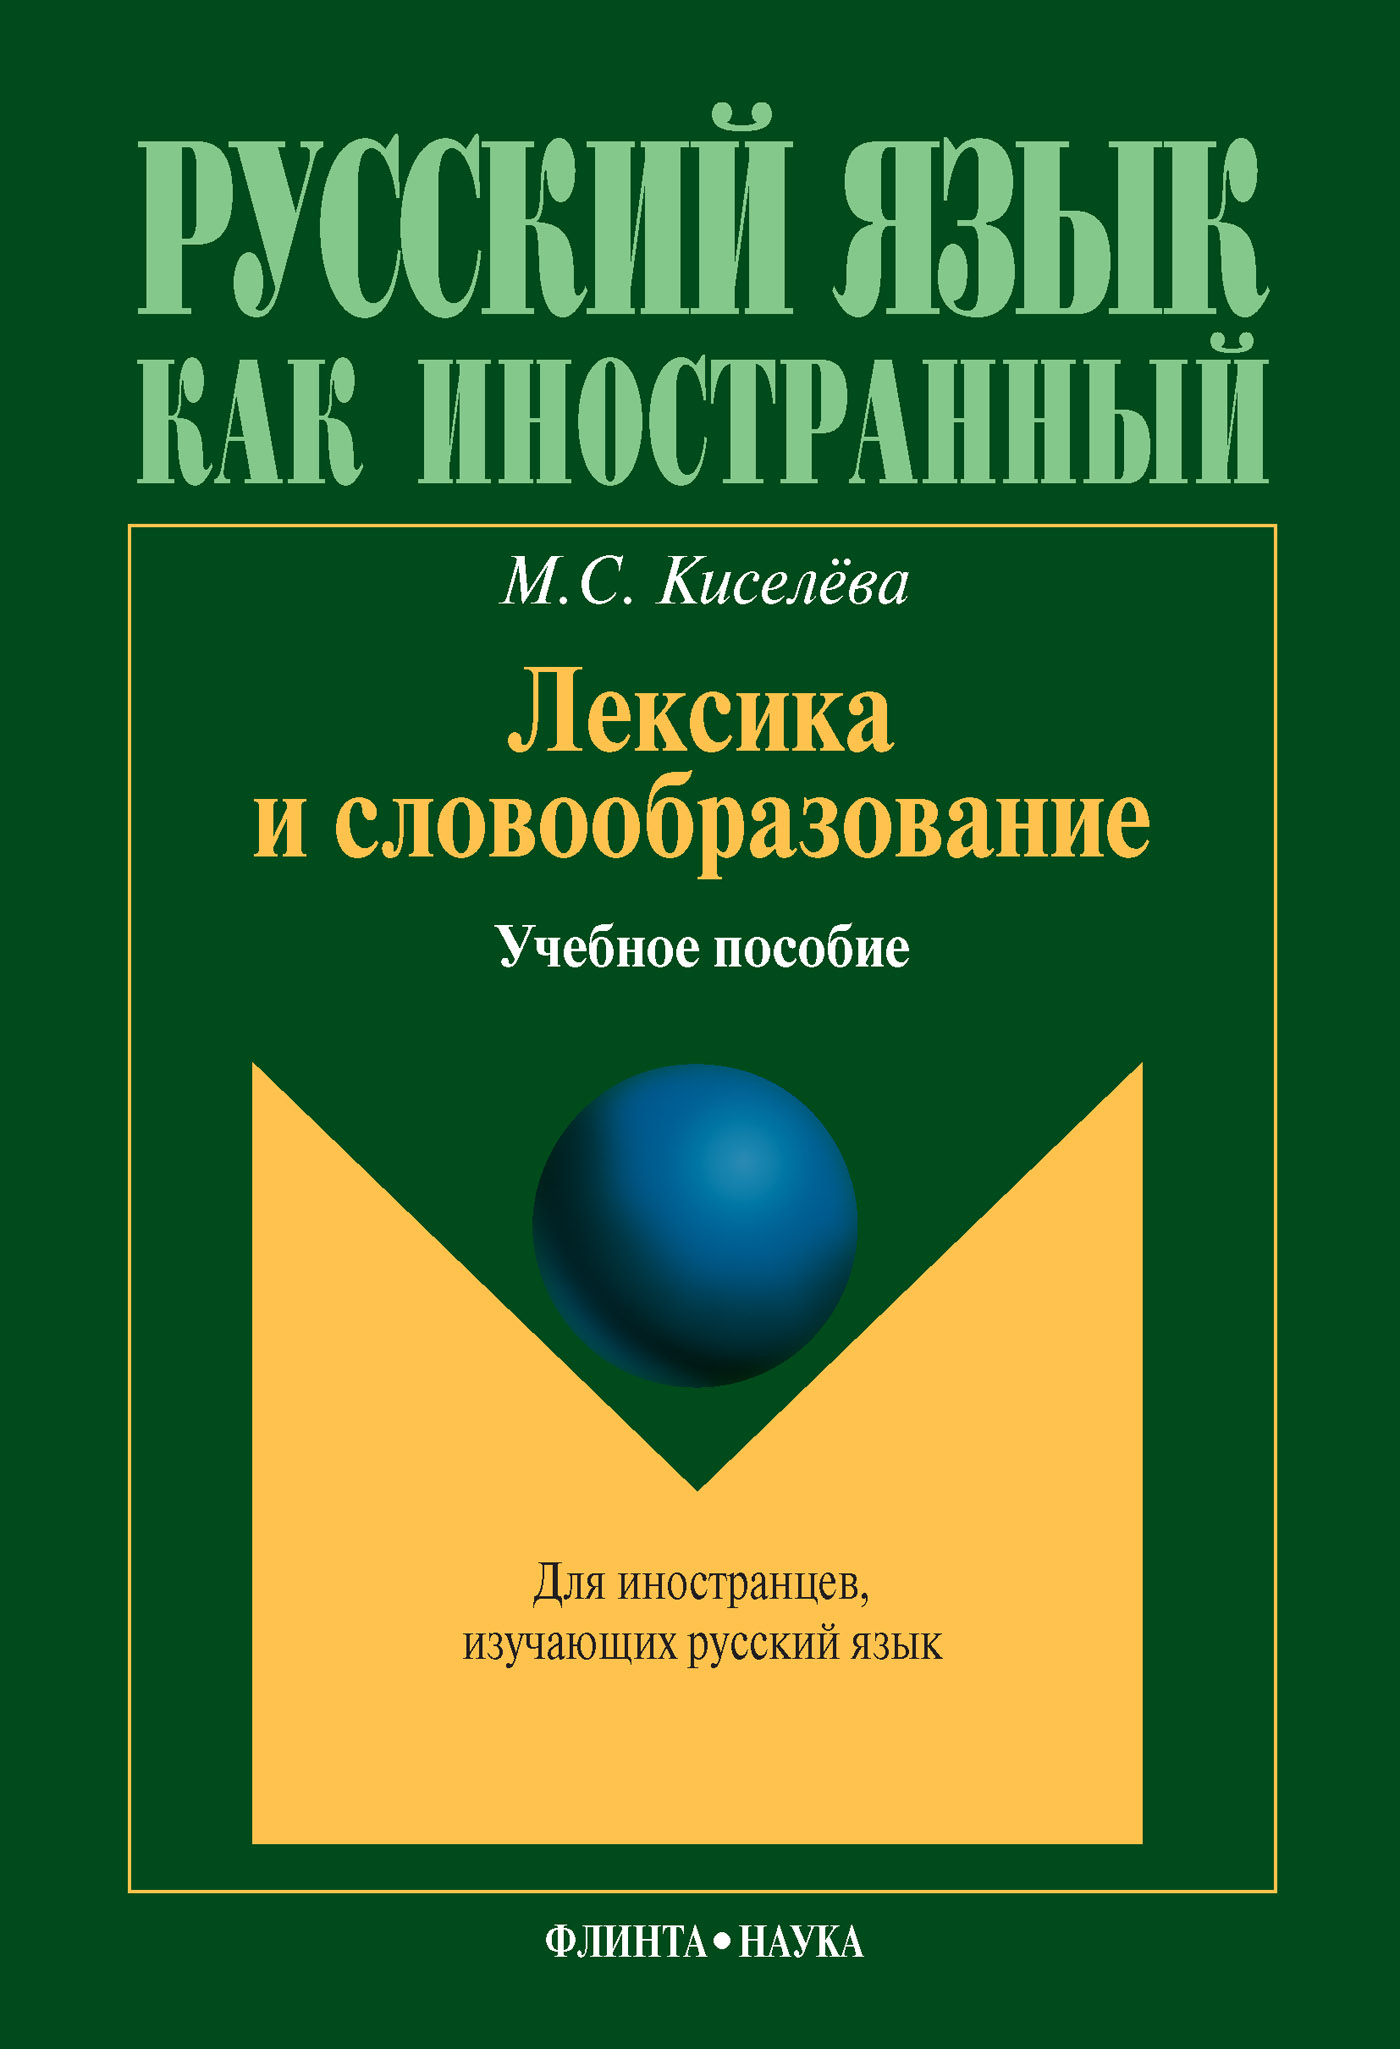 М. С. Киселева Лексика и словообразование. Учебное пособие